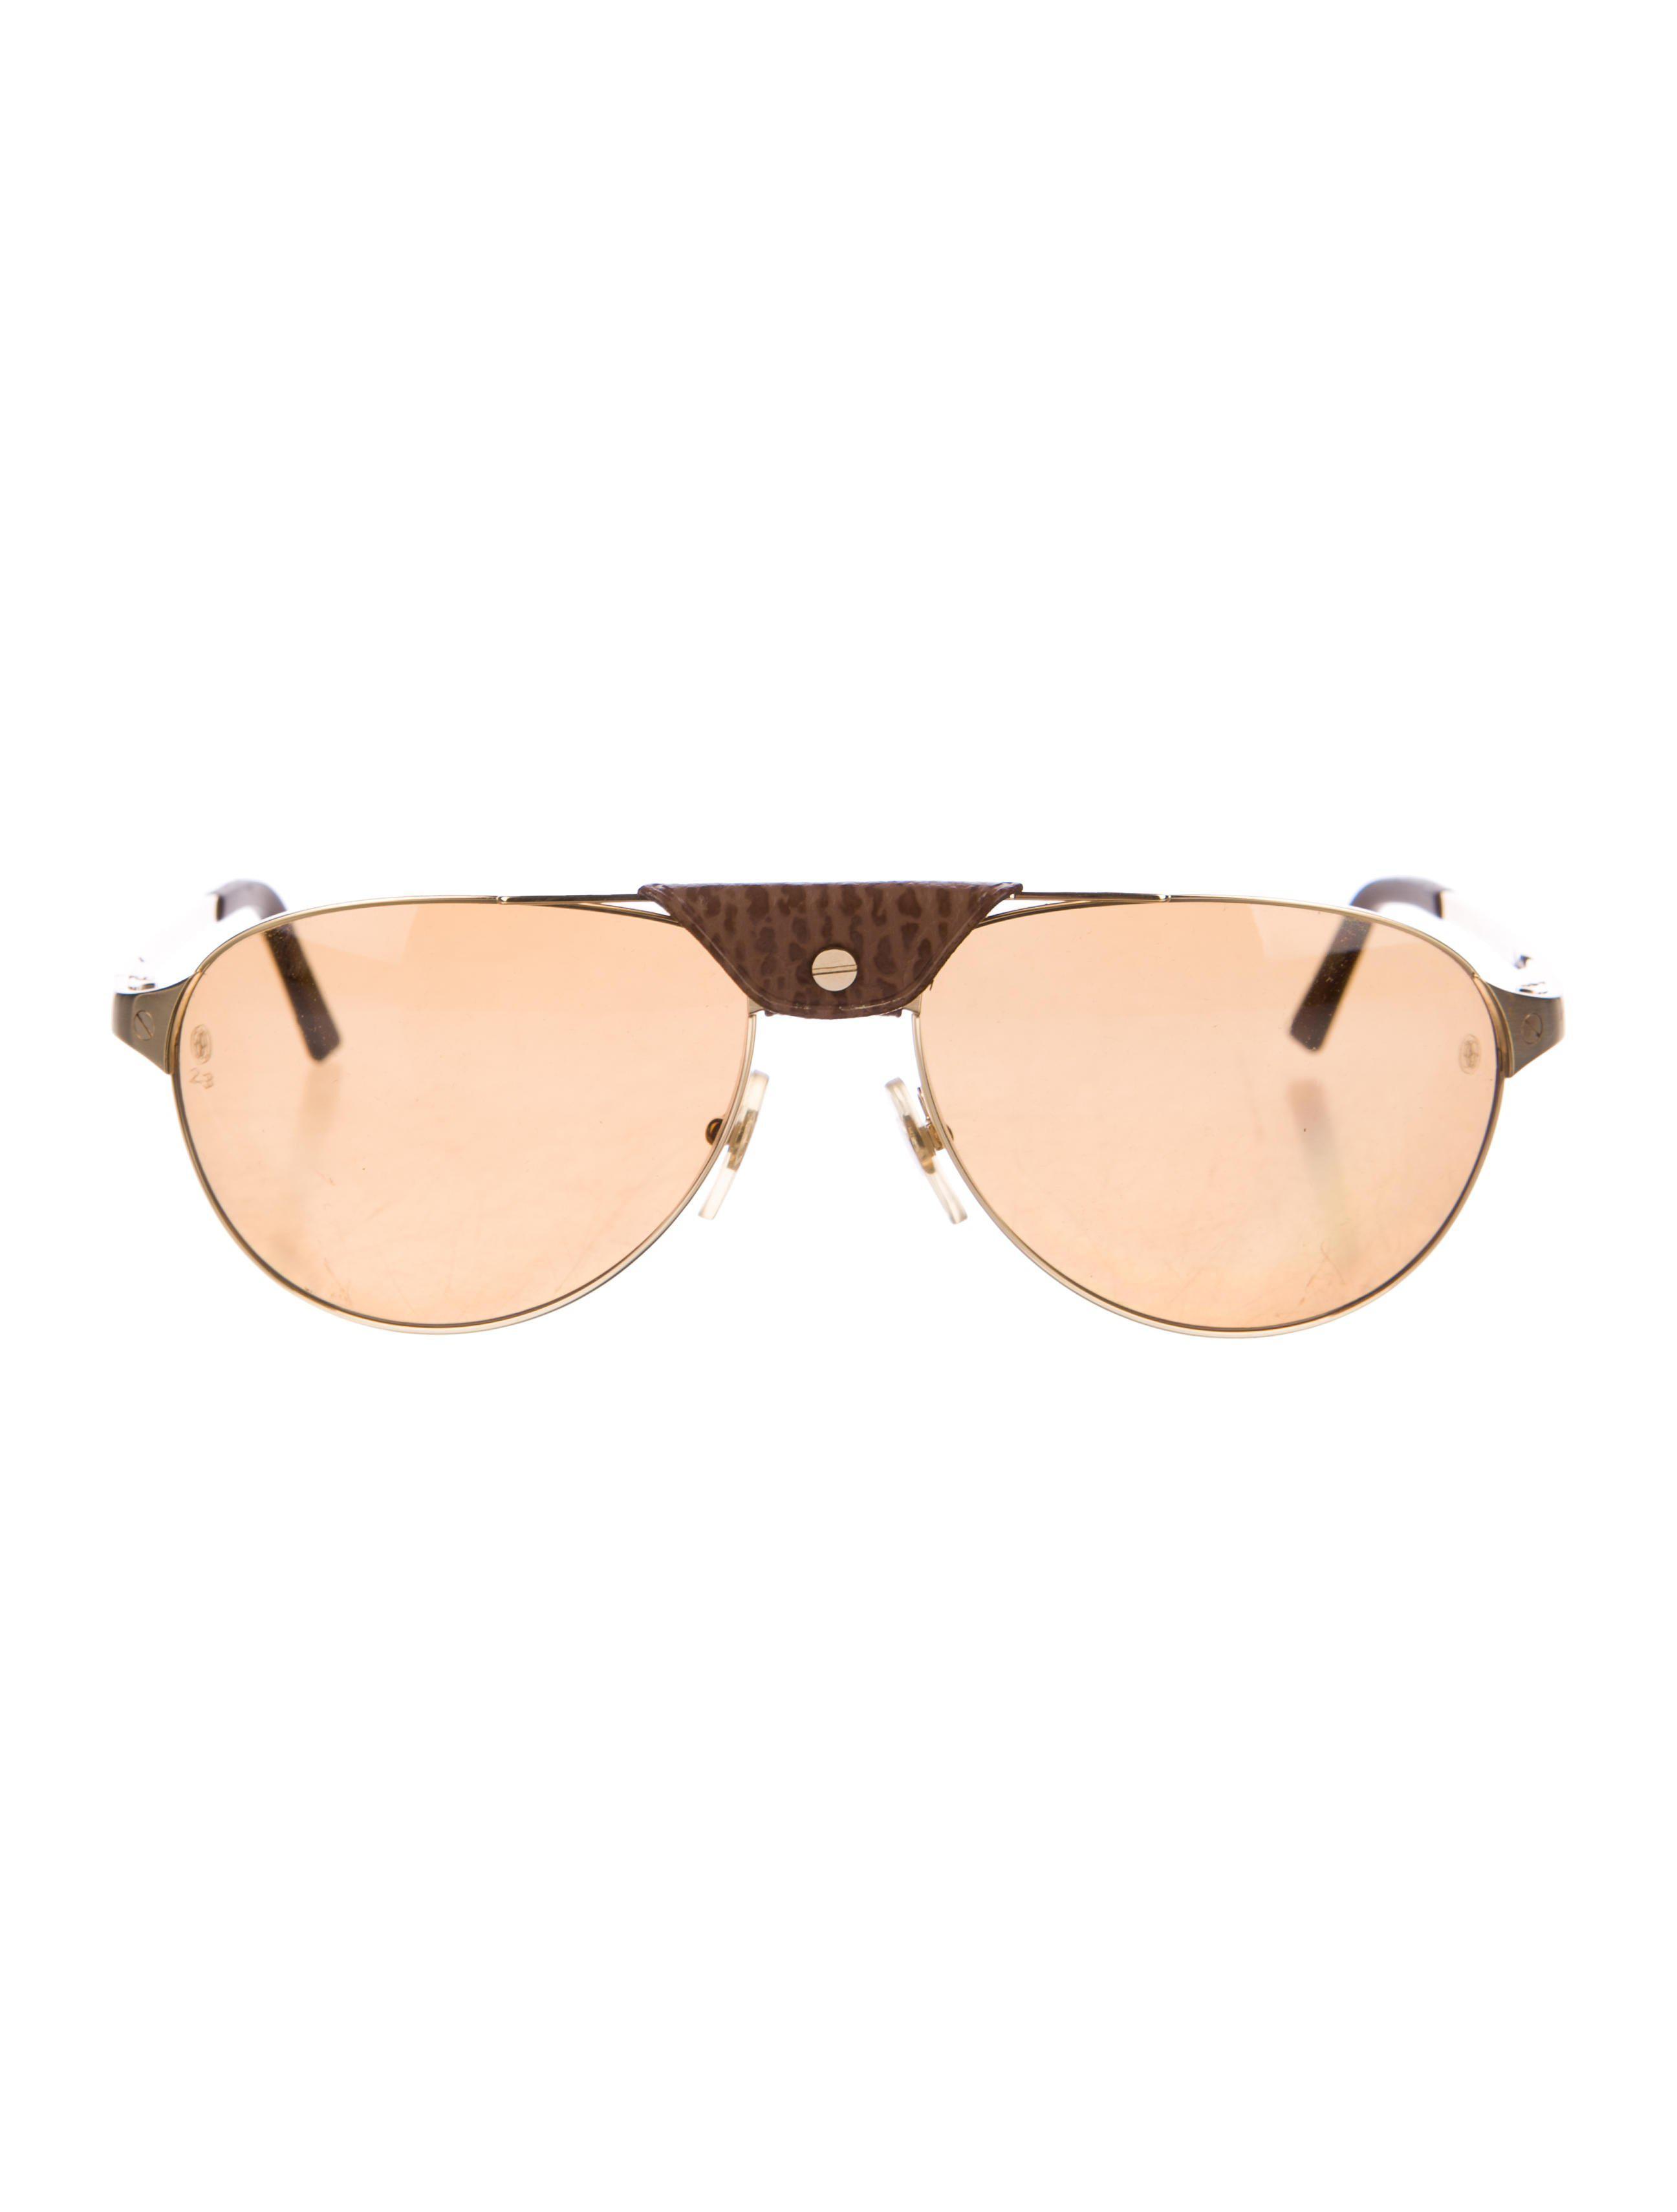 04735ceabe Lyst - Cartier Santos Dumont Aviator Sunglasses in Brown